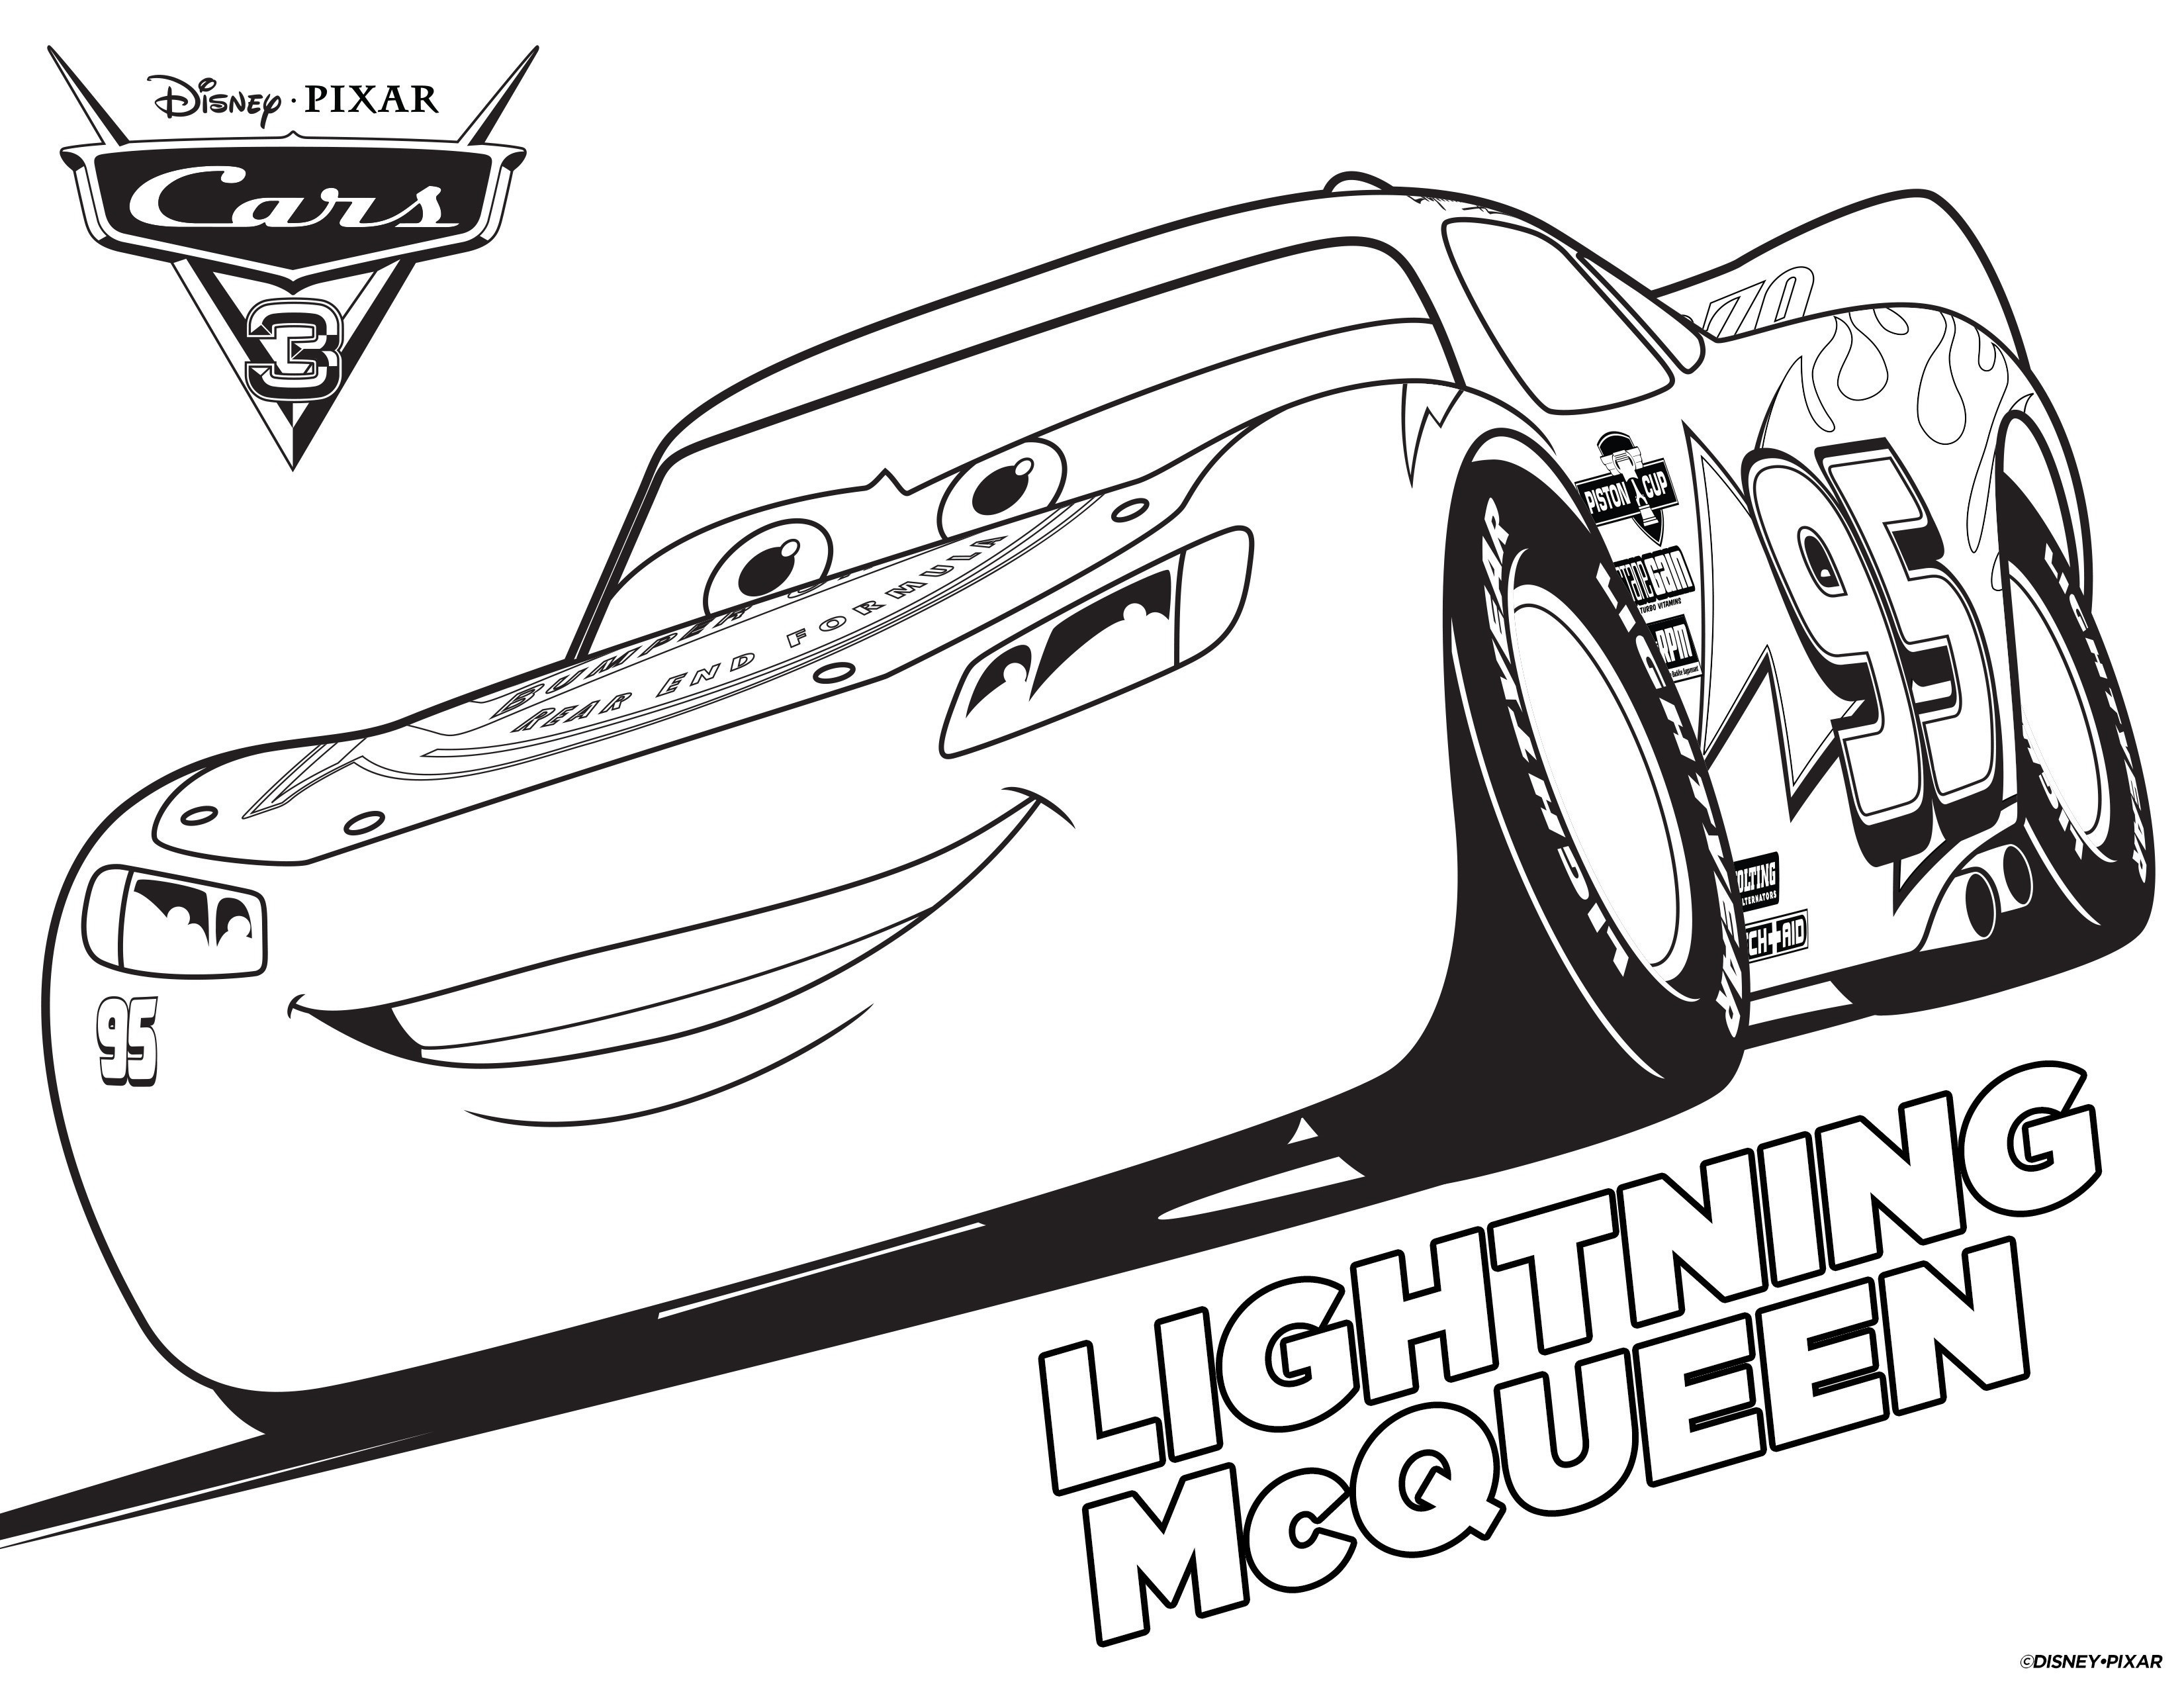 Lightning Mcqueen Ausmalen Neu Awesome Colouring Disney Cars Genial Cars Ausmalbilder Lightning Galerie